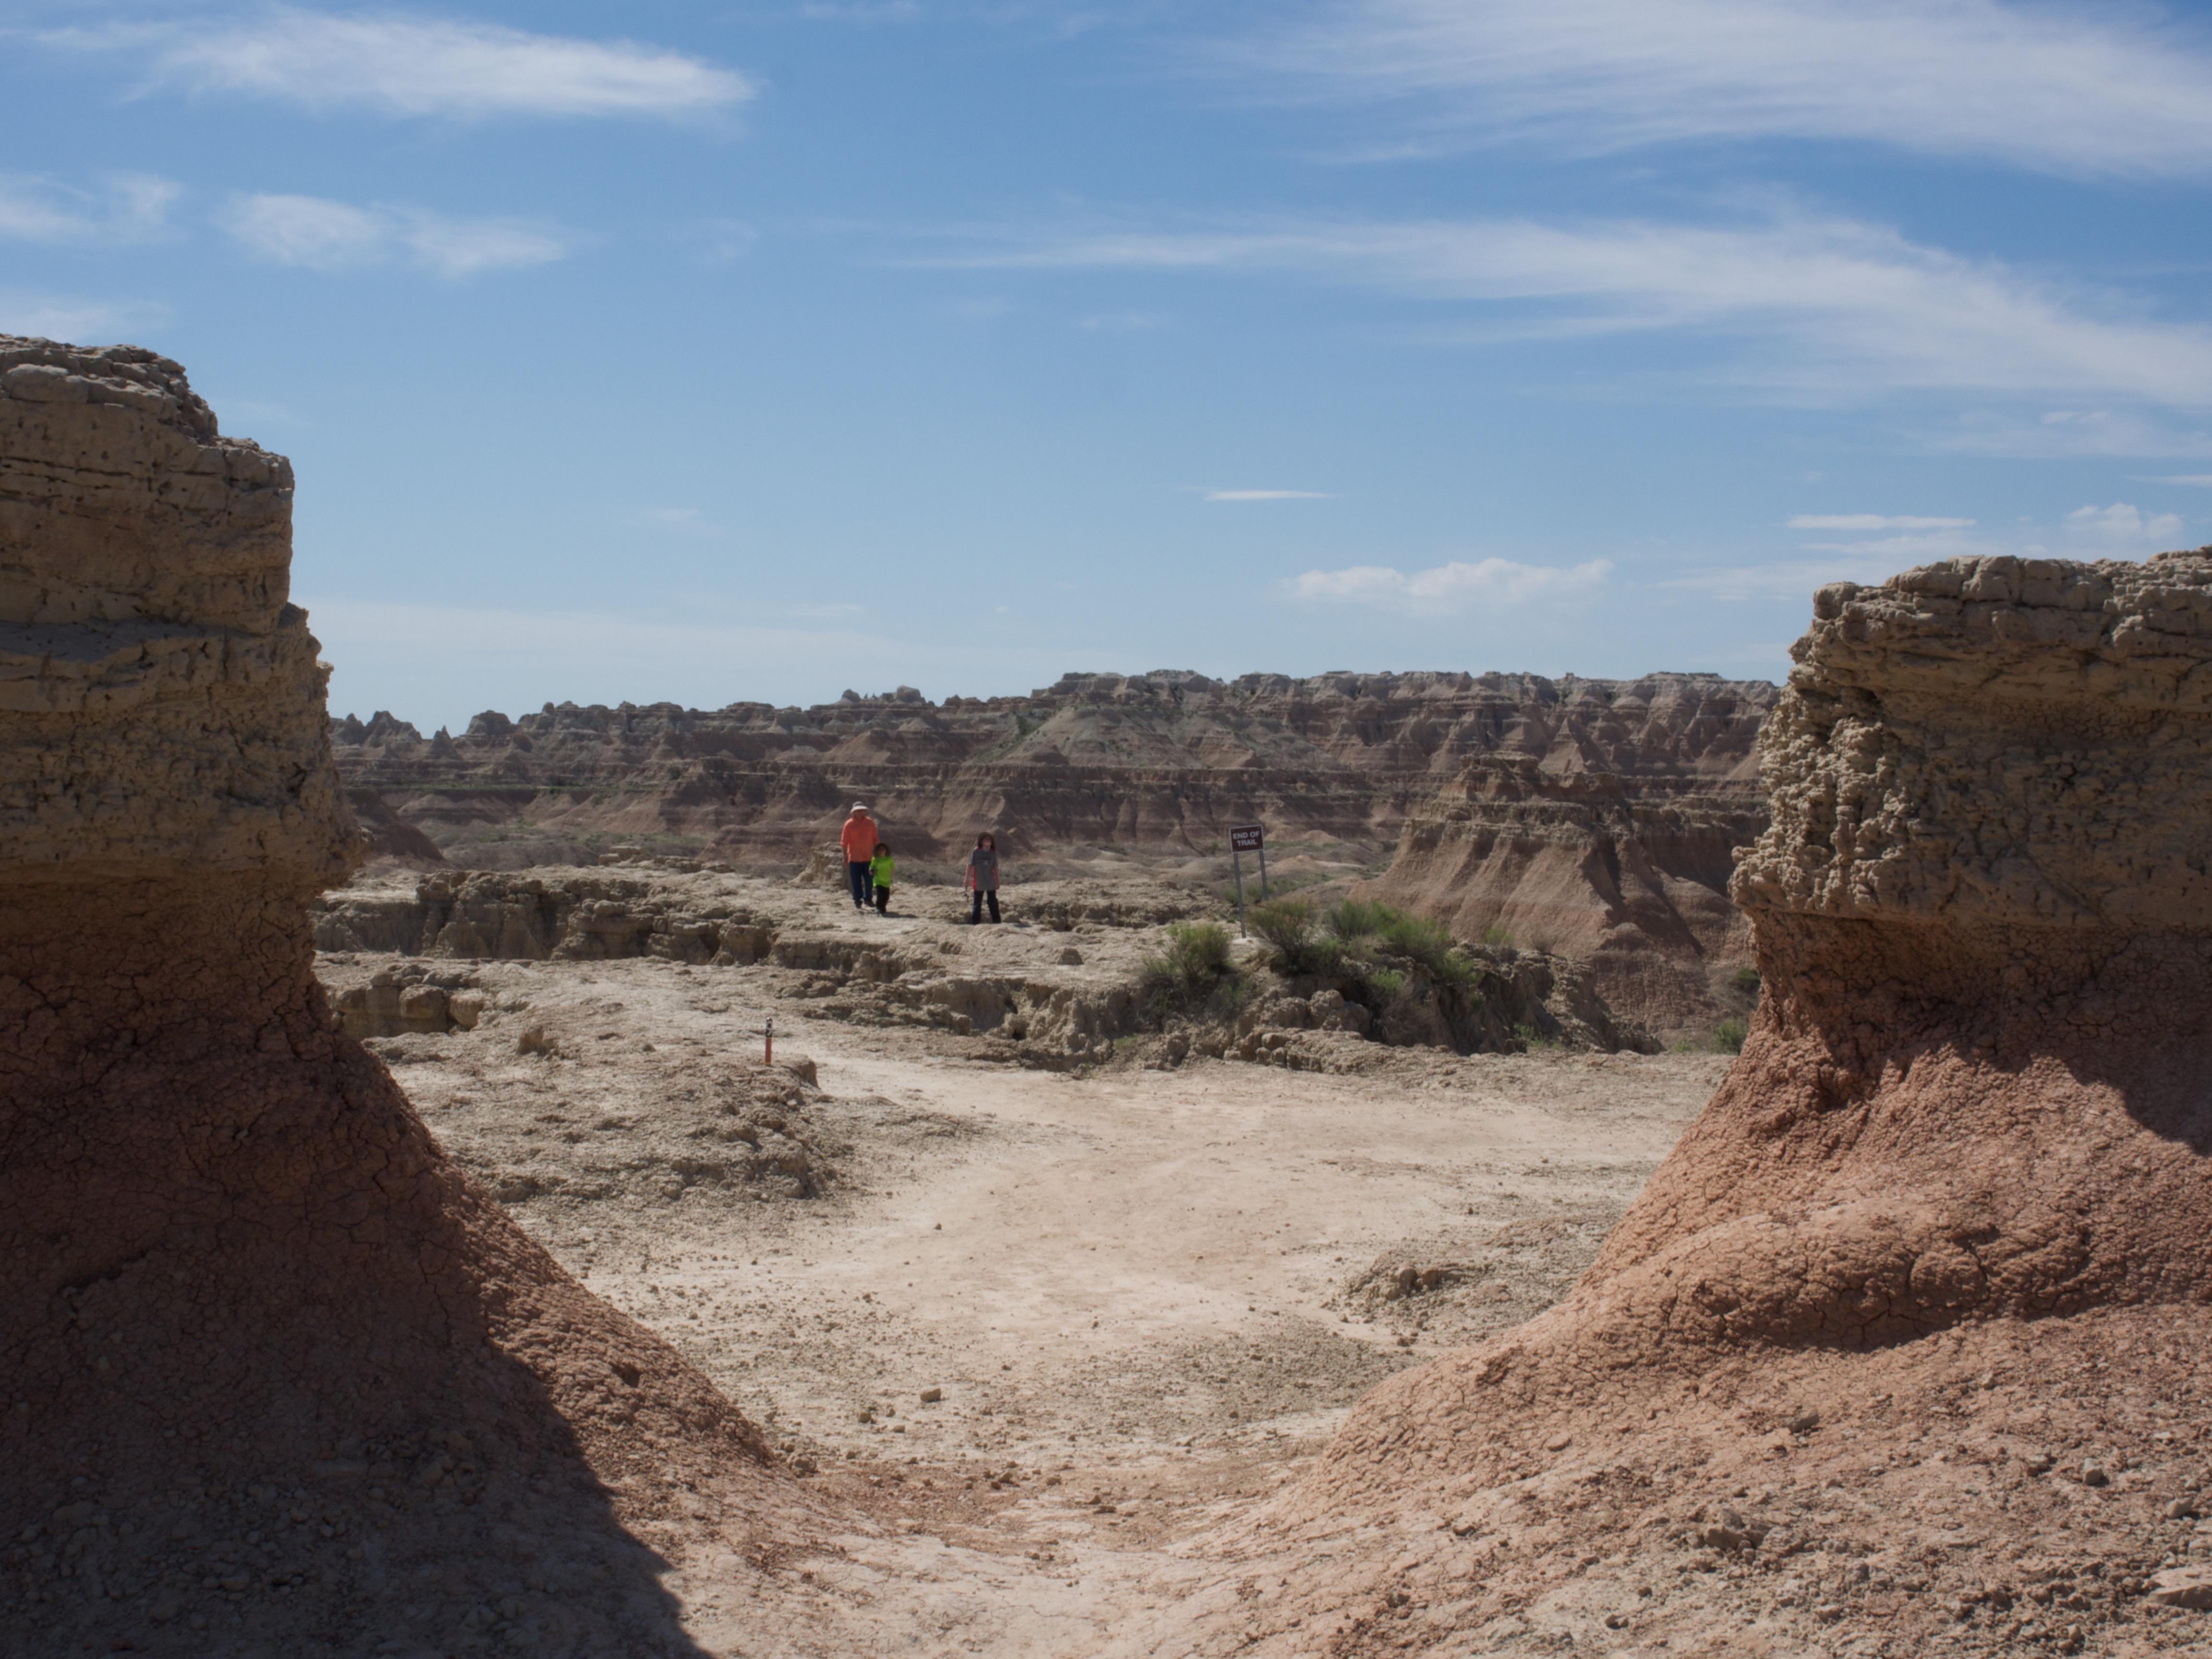 Minutemen, Missiles and Badlands… OH MY! – Breighton\'s Journey